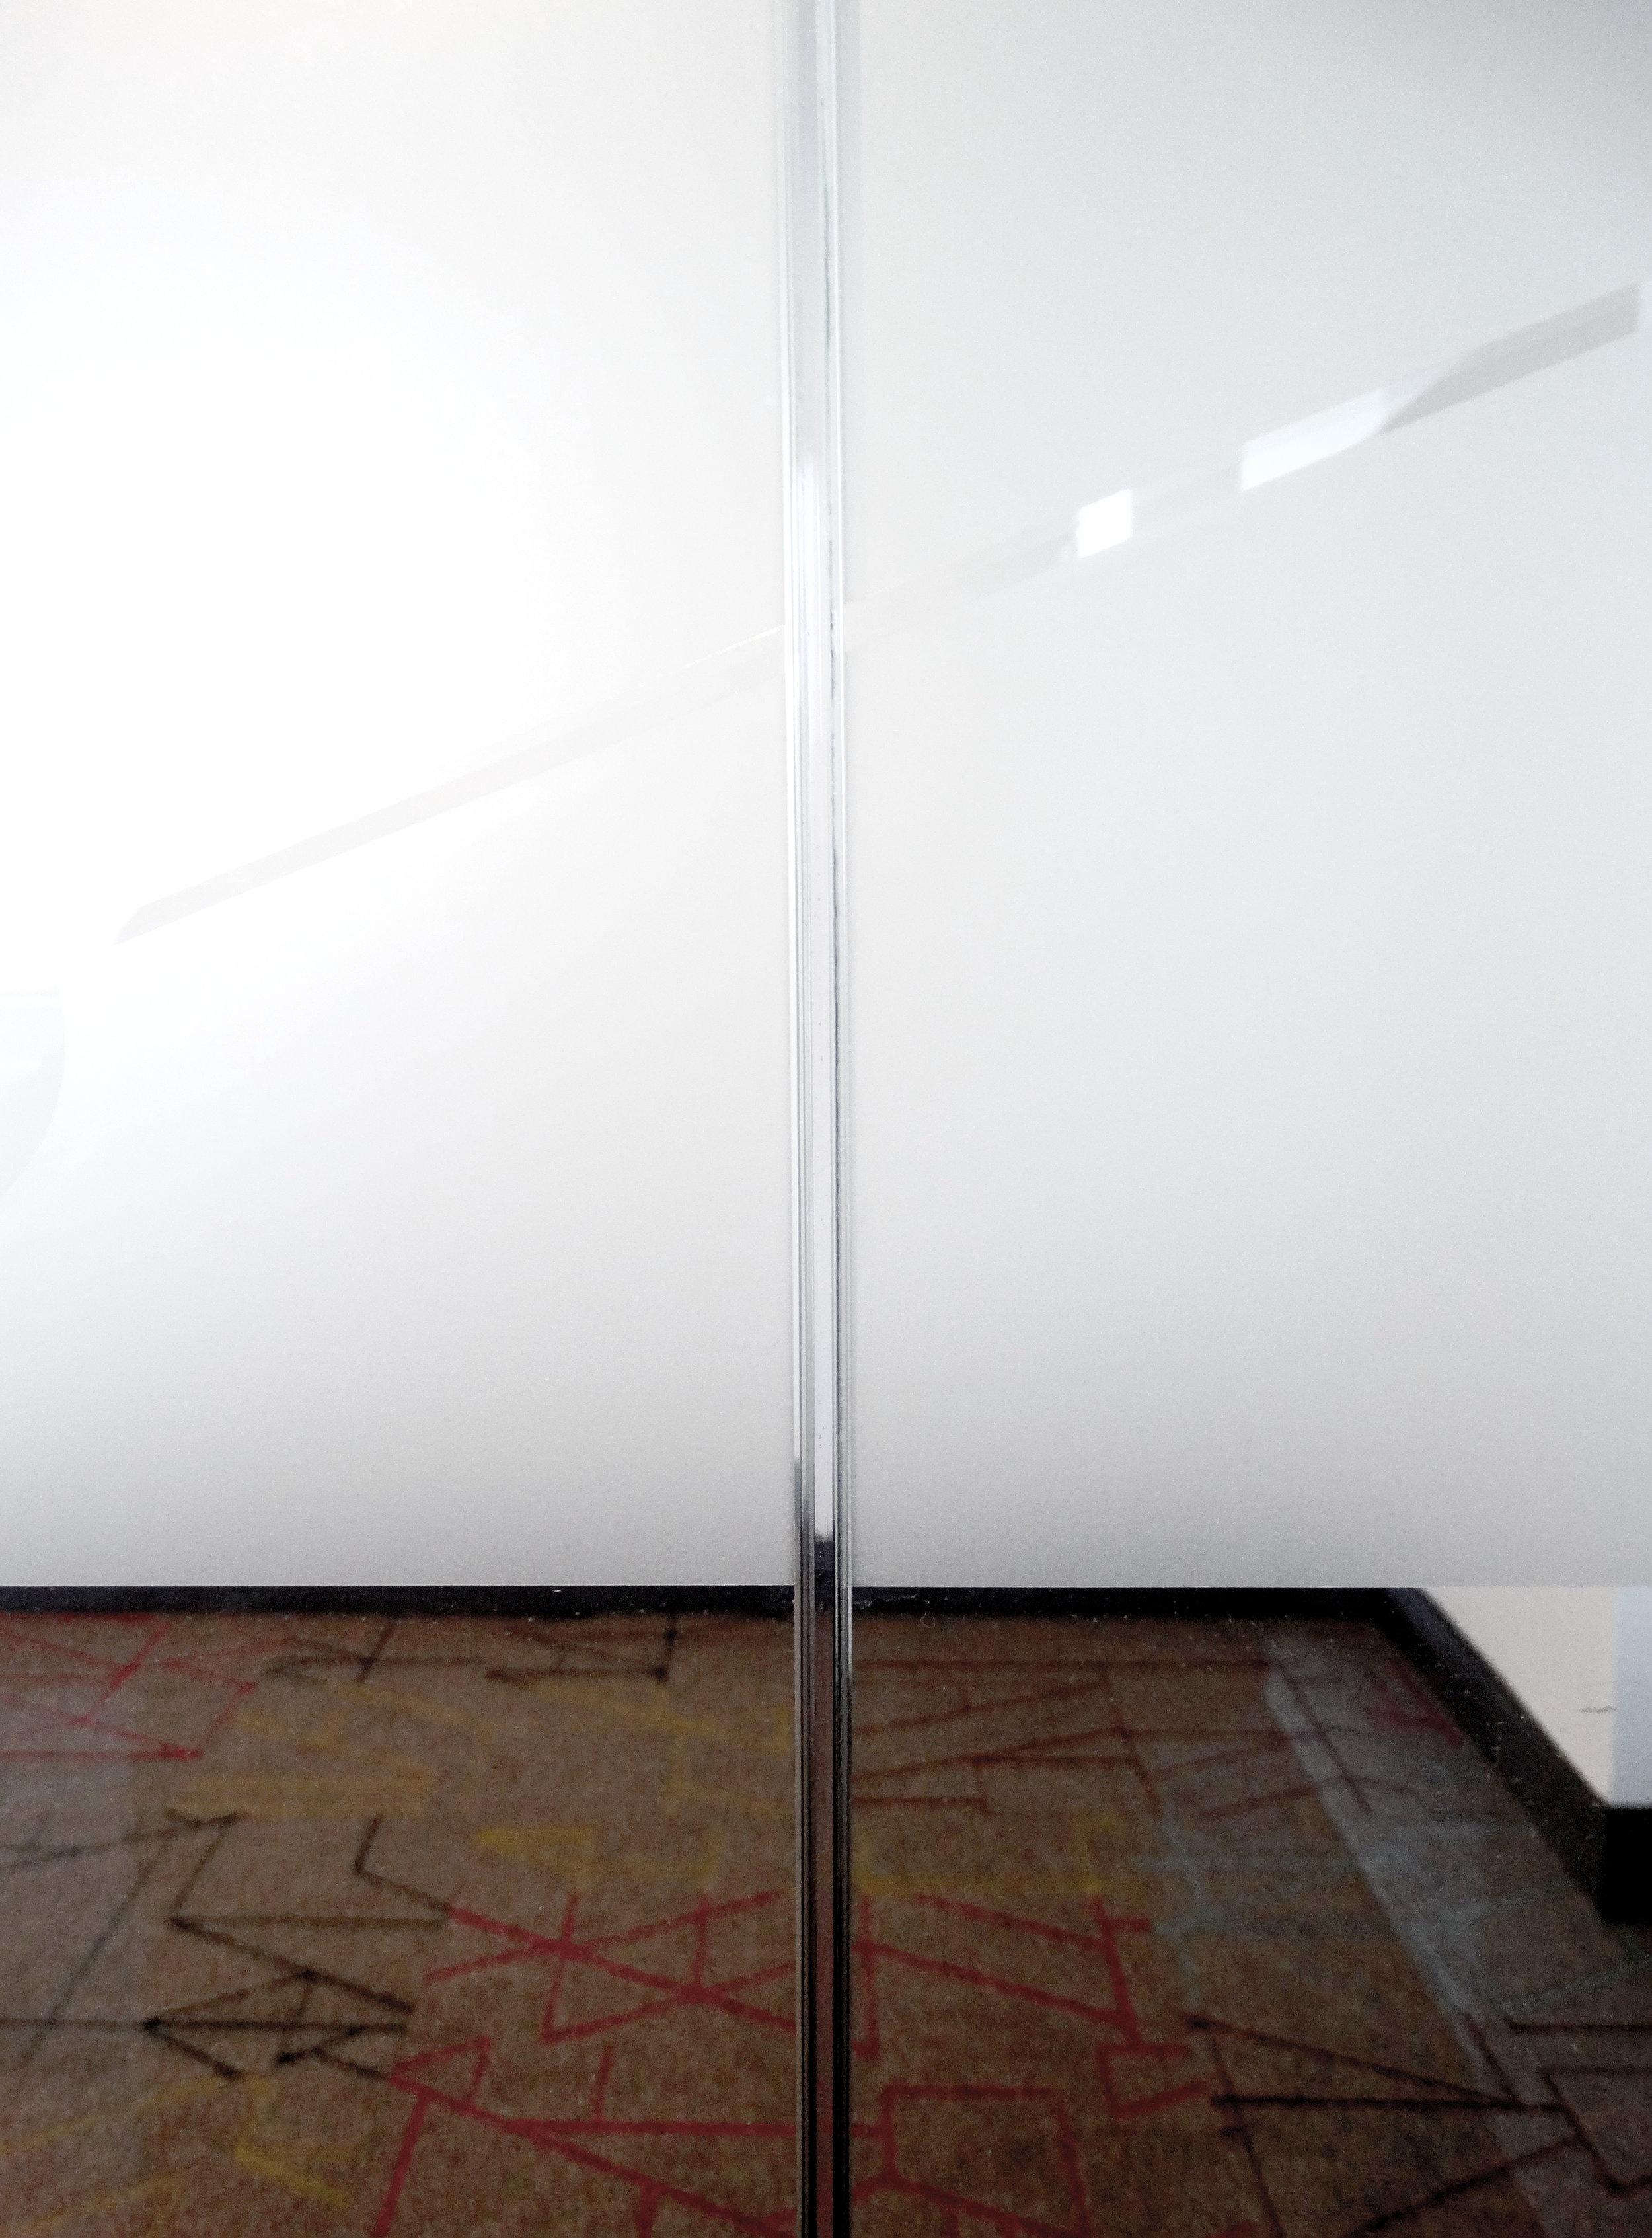 Litespace Butt Glazed Glass Polycarbonate Channel - Spaceworks AI.jpg